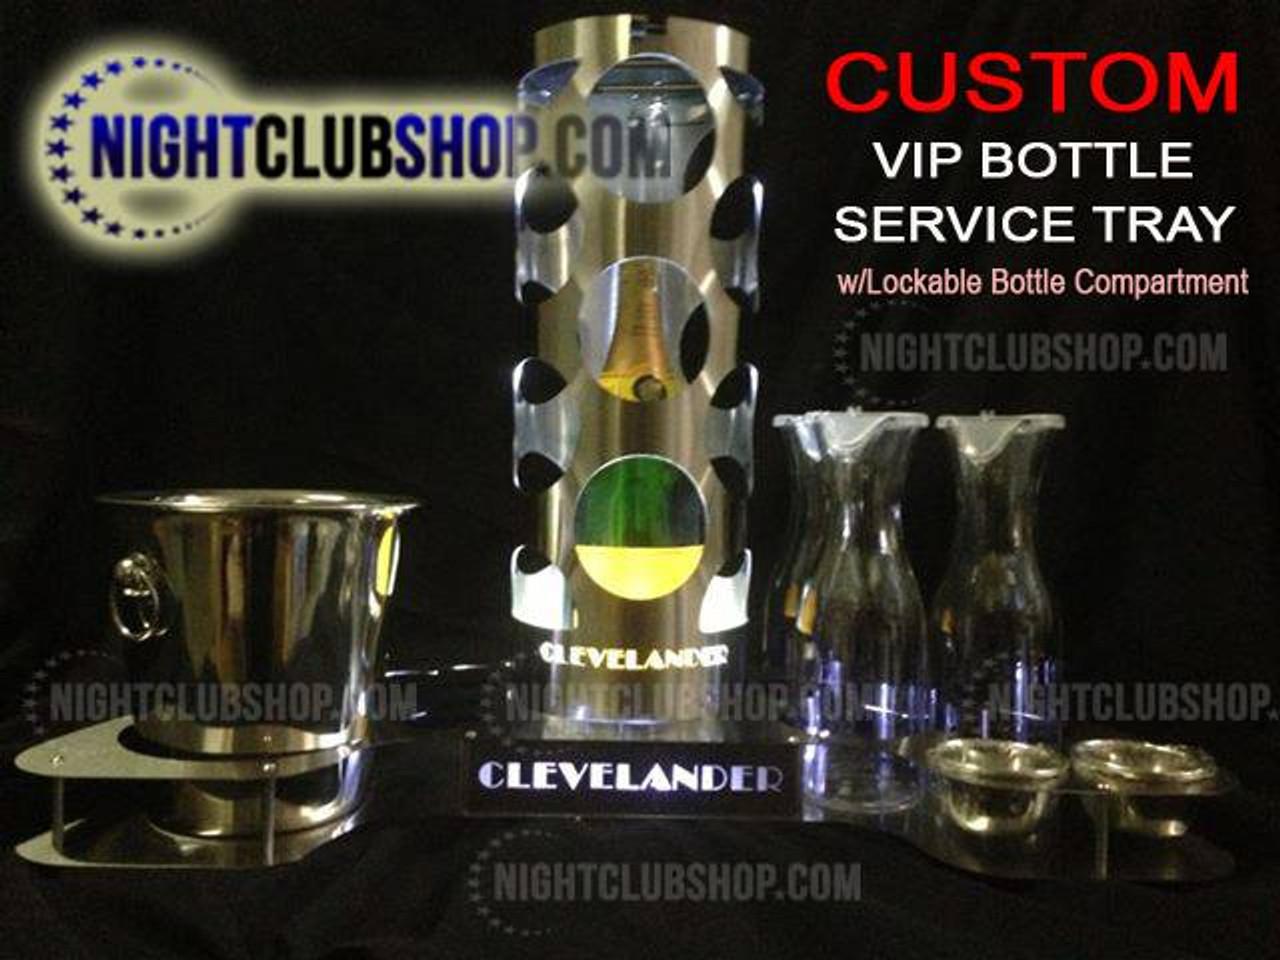 Elite, VIP, Bottle, Service, Bottle Service Tray, Tray, custom, engraved, nightclub, tray, trey, serving tray, liquor tray, Champagne, Bottle service, Bottle delivery